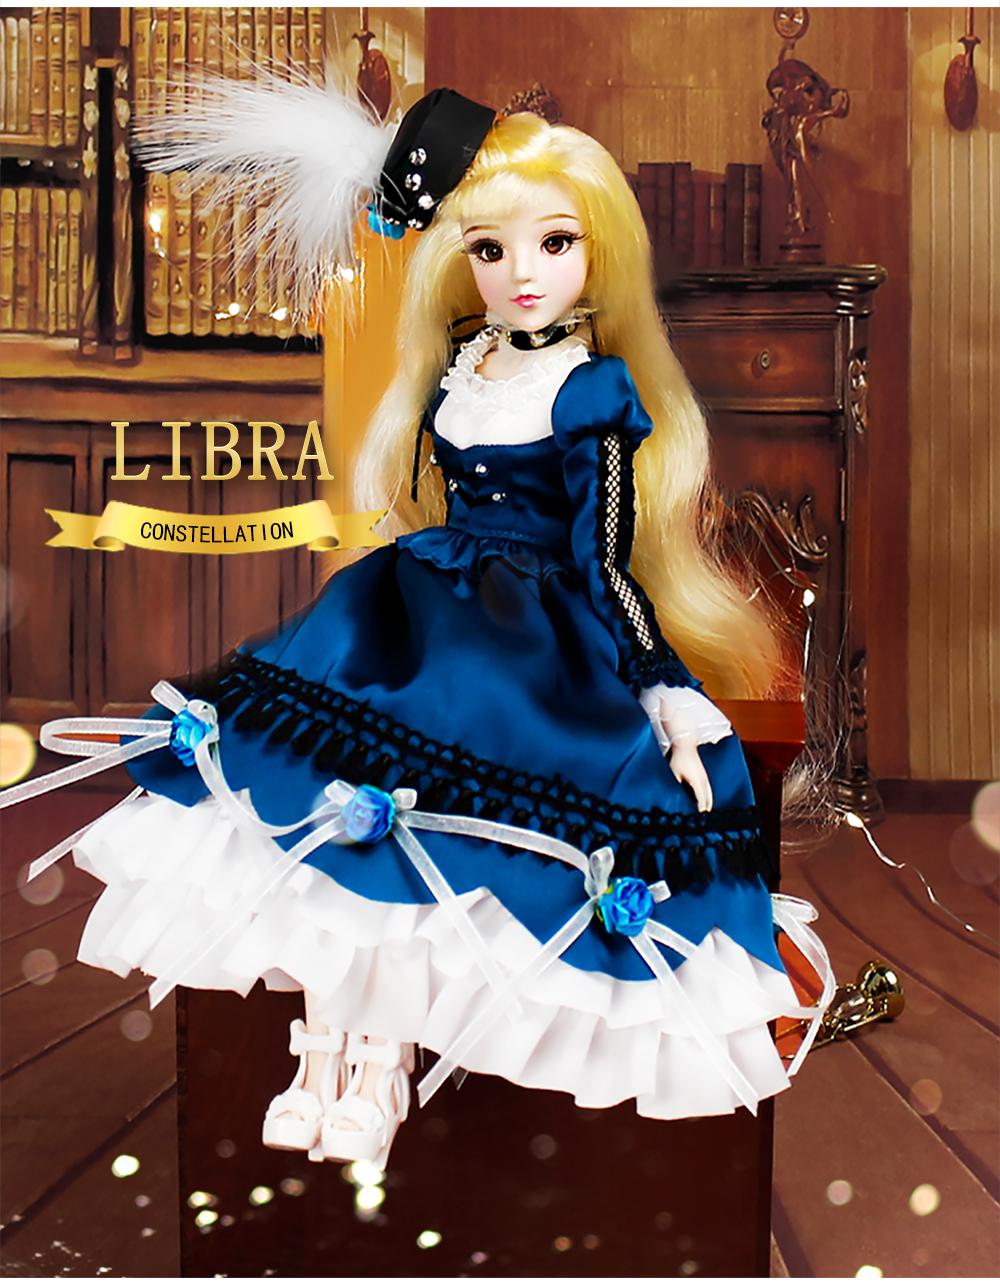 Mmgirl 12 Constellation Libra Bjd Blythe Reborn Realistic